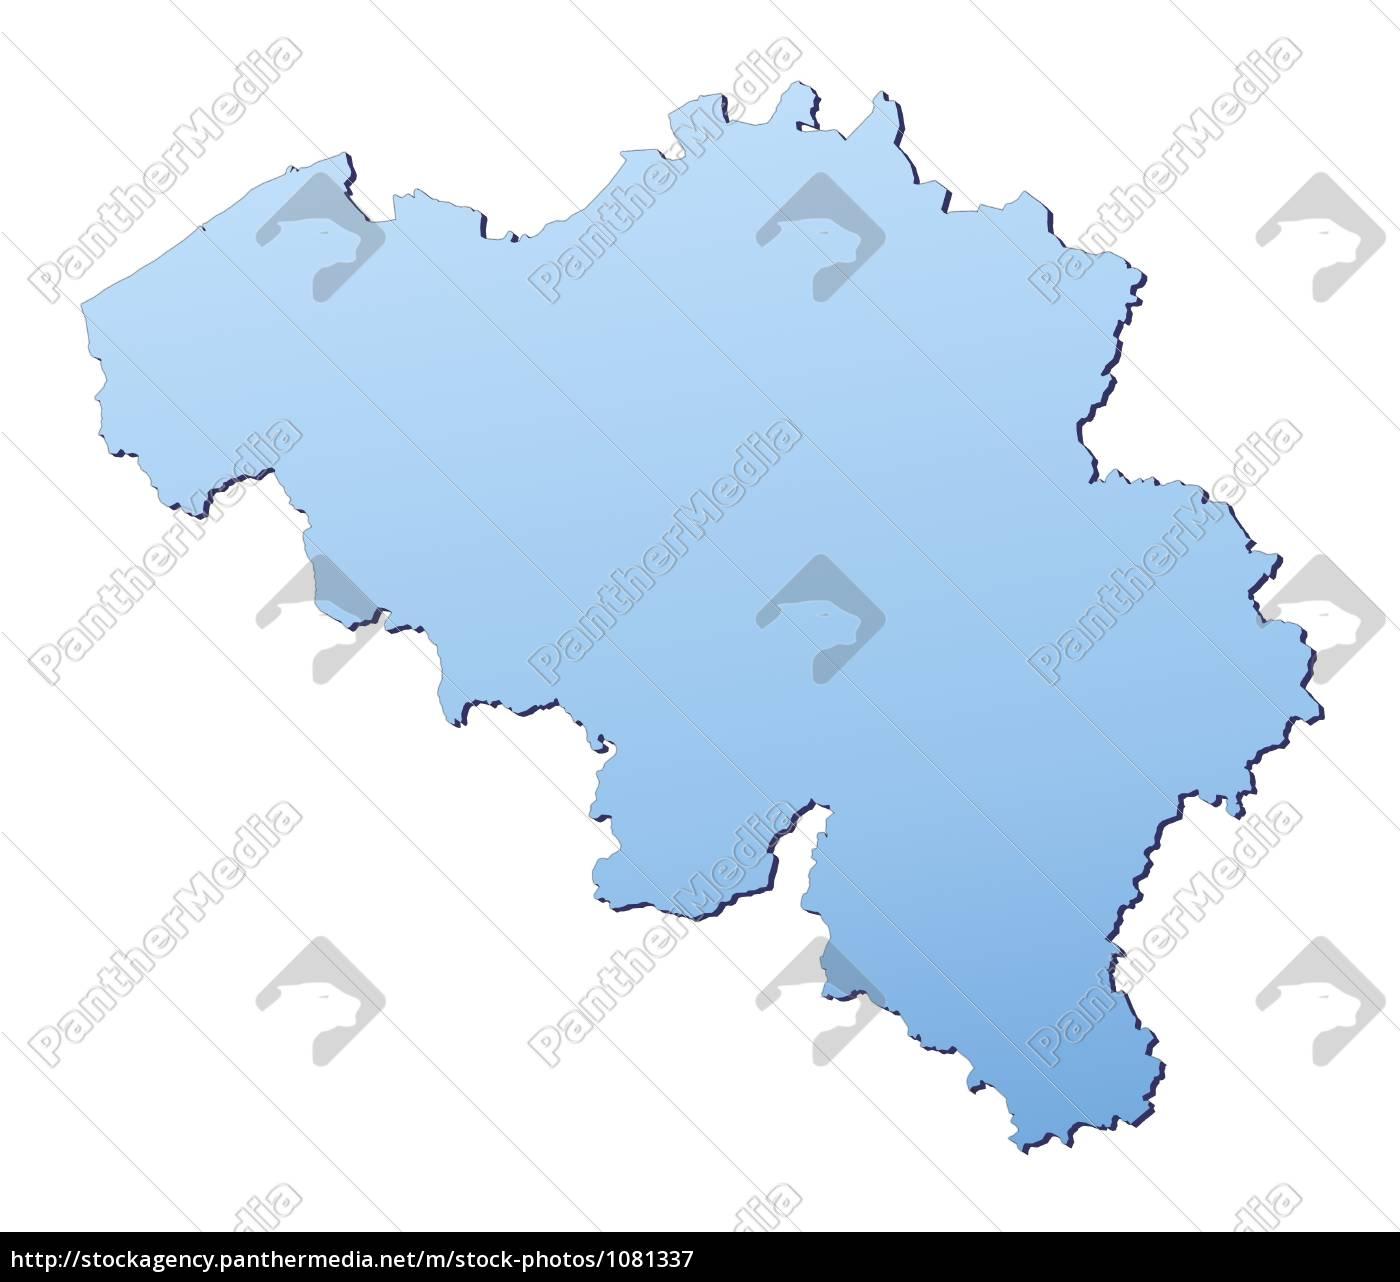 Belgien Karte Umriss.Lizenzfreies Bild 1081337 Belgien Karte